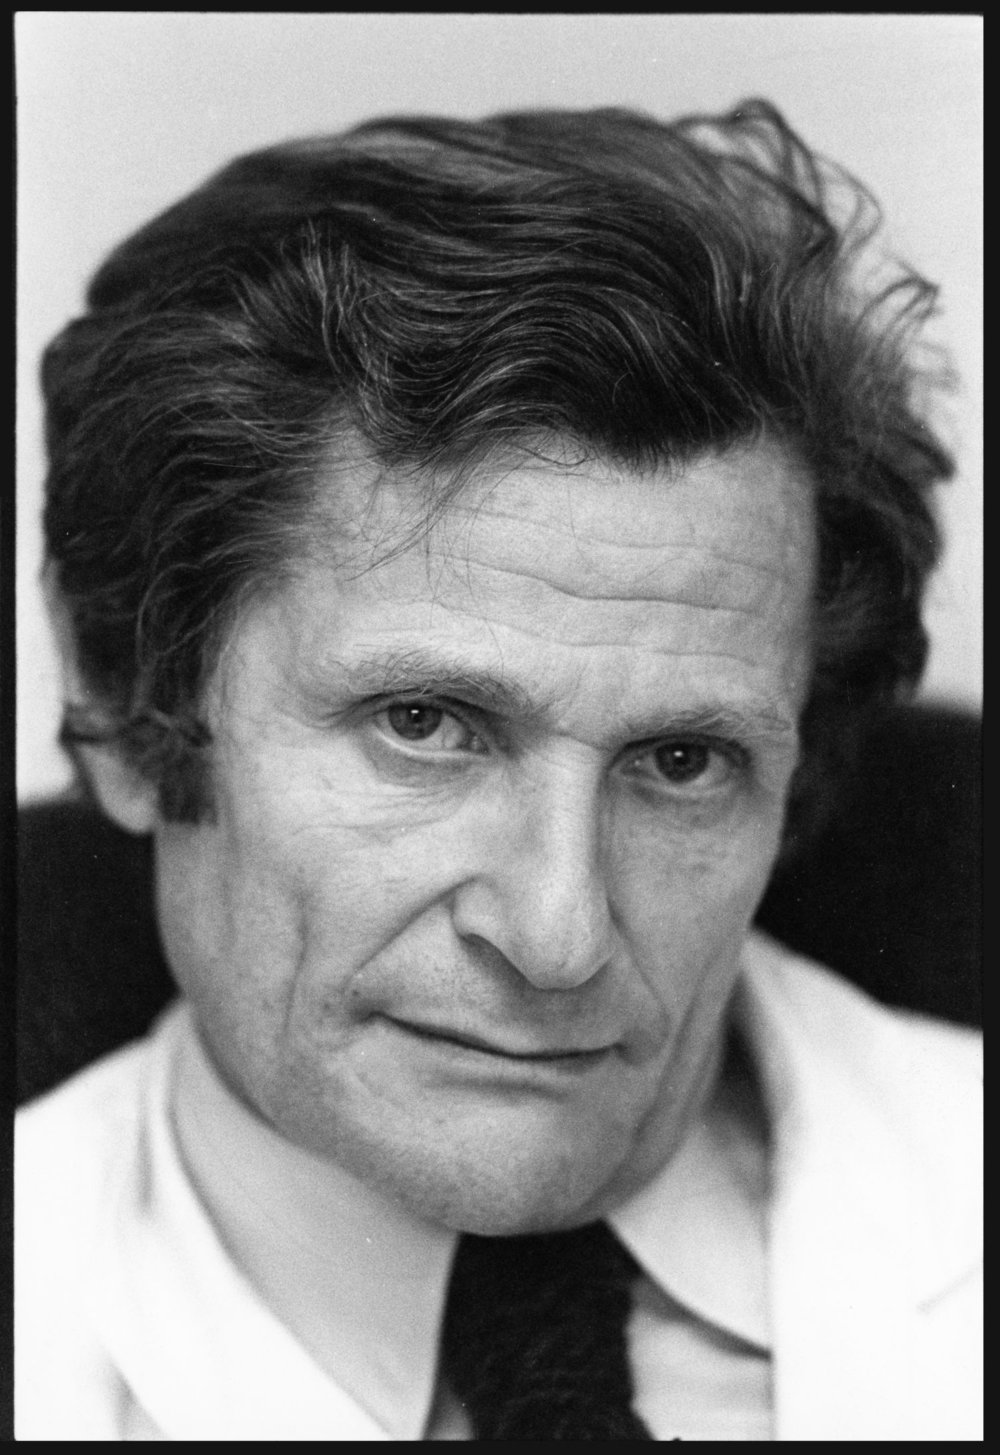 Leon Schwartzenberg - 1978 | Changer la mort | Hôpital Villejuif | Photo sandrine cohen